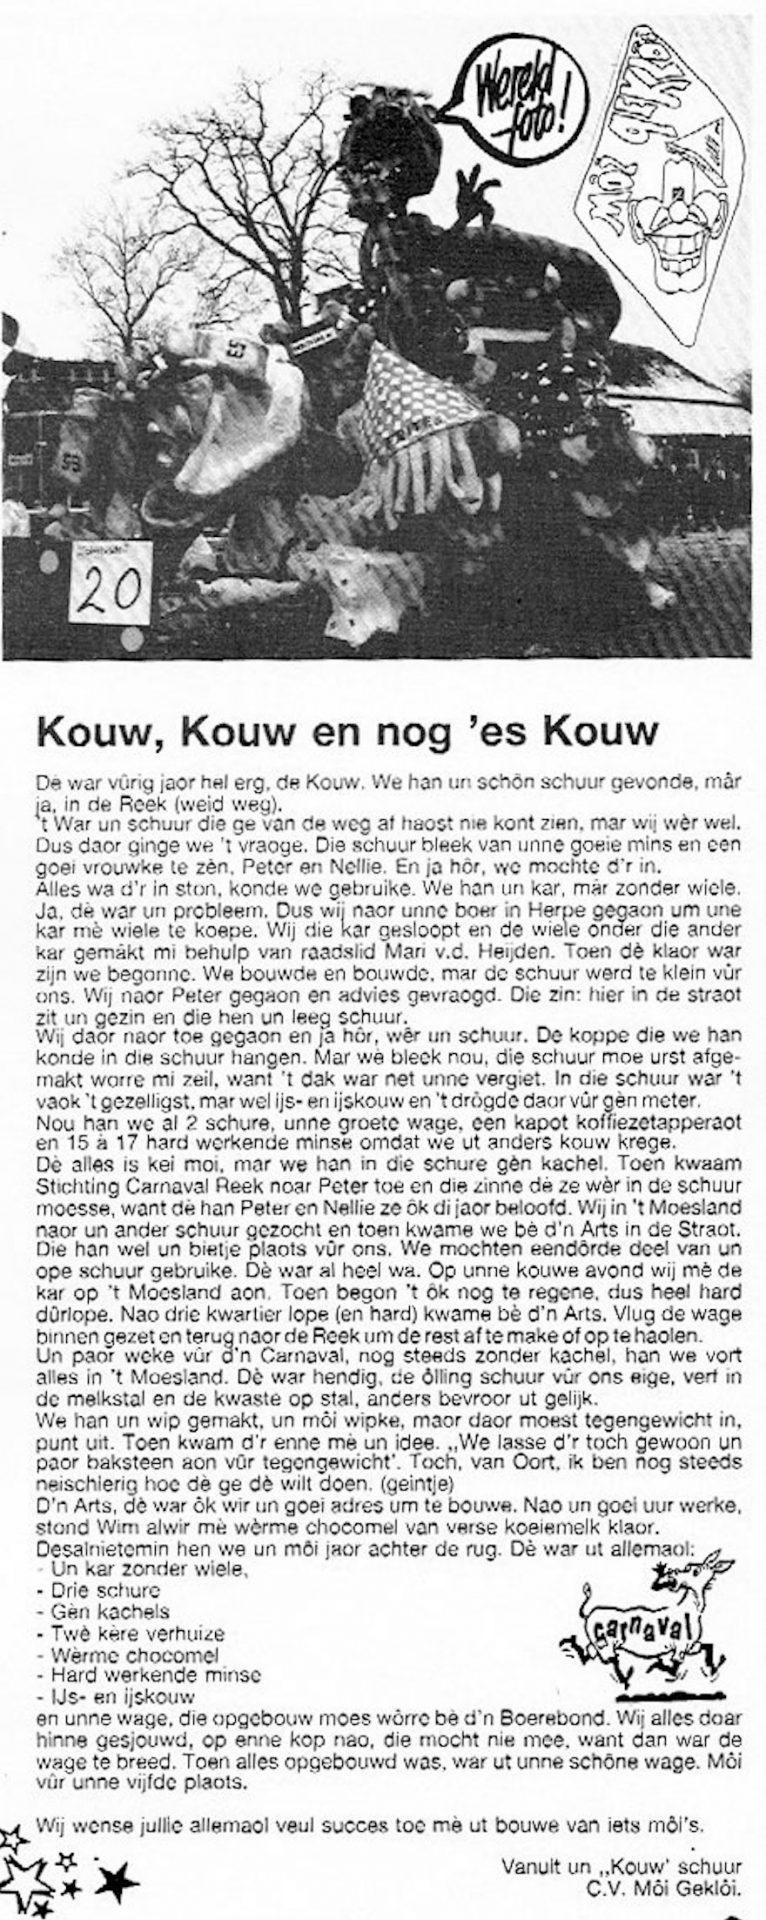 Stukje uit de carnavalskrant van Moi Gekloi - 1992